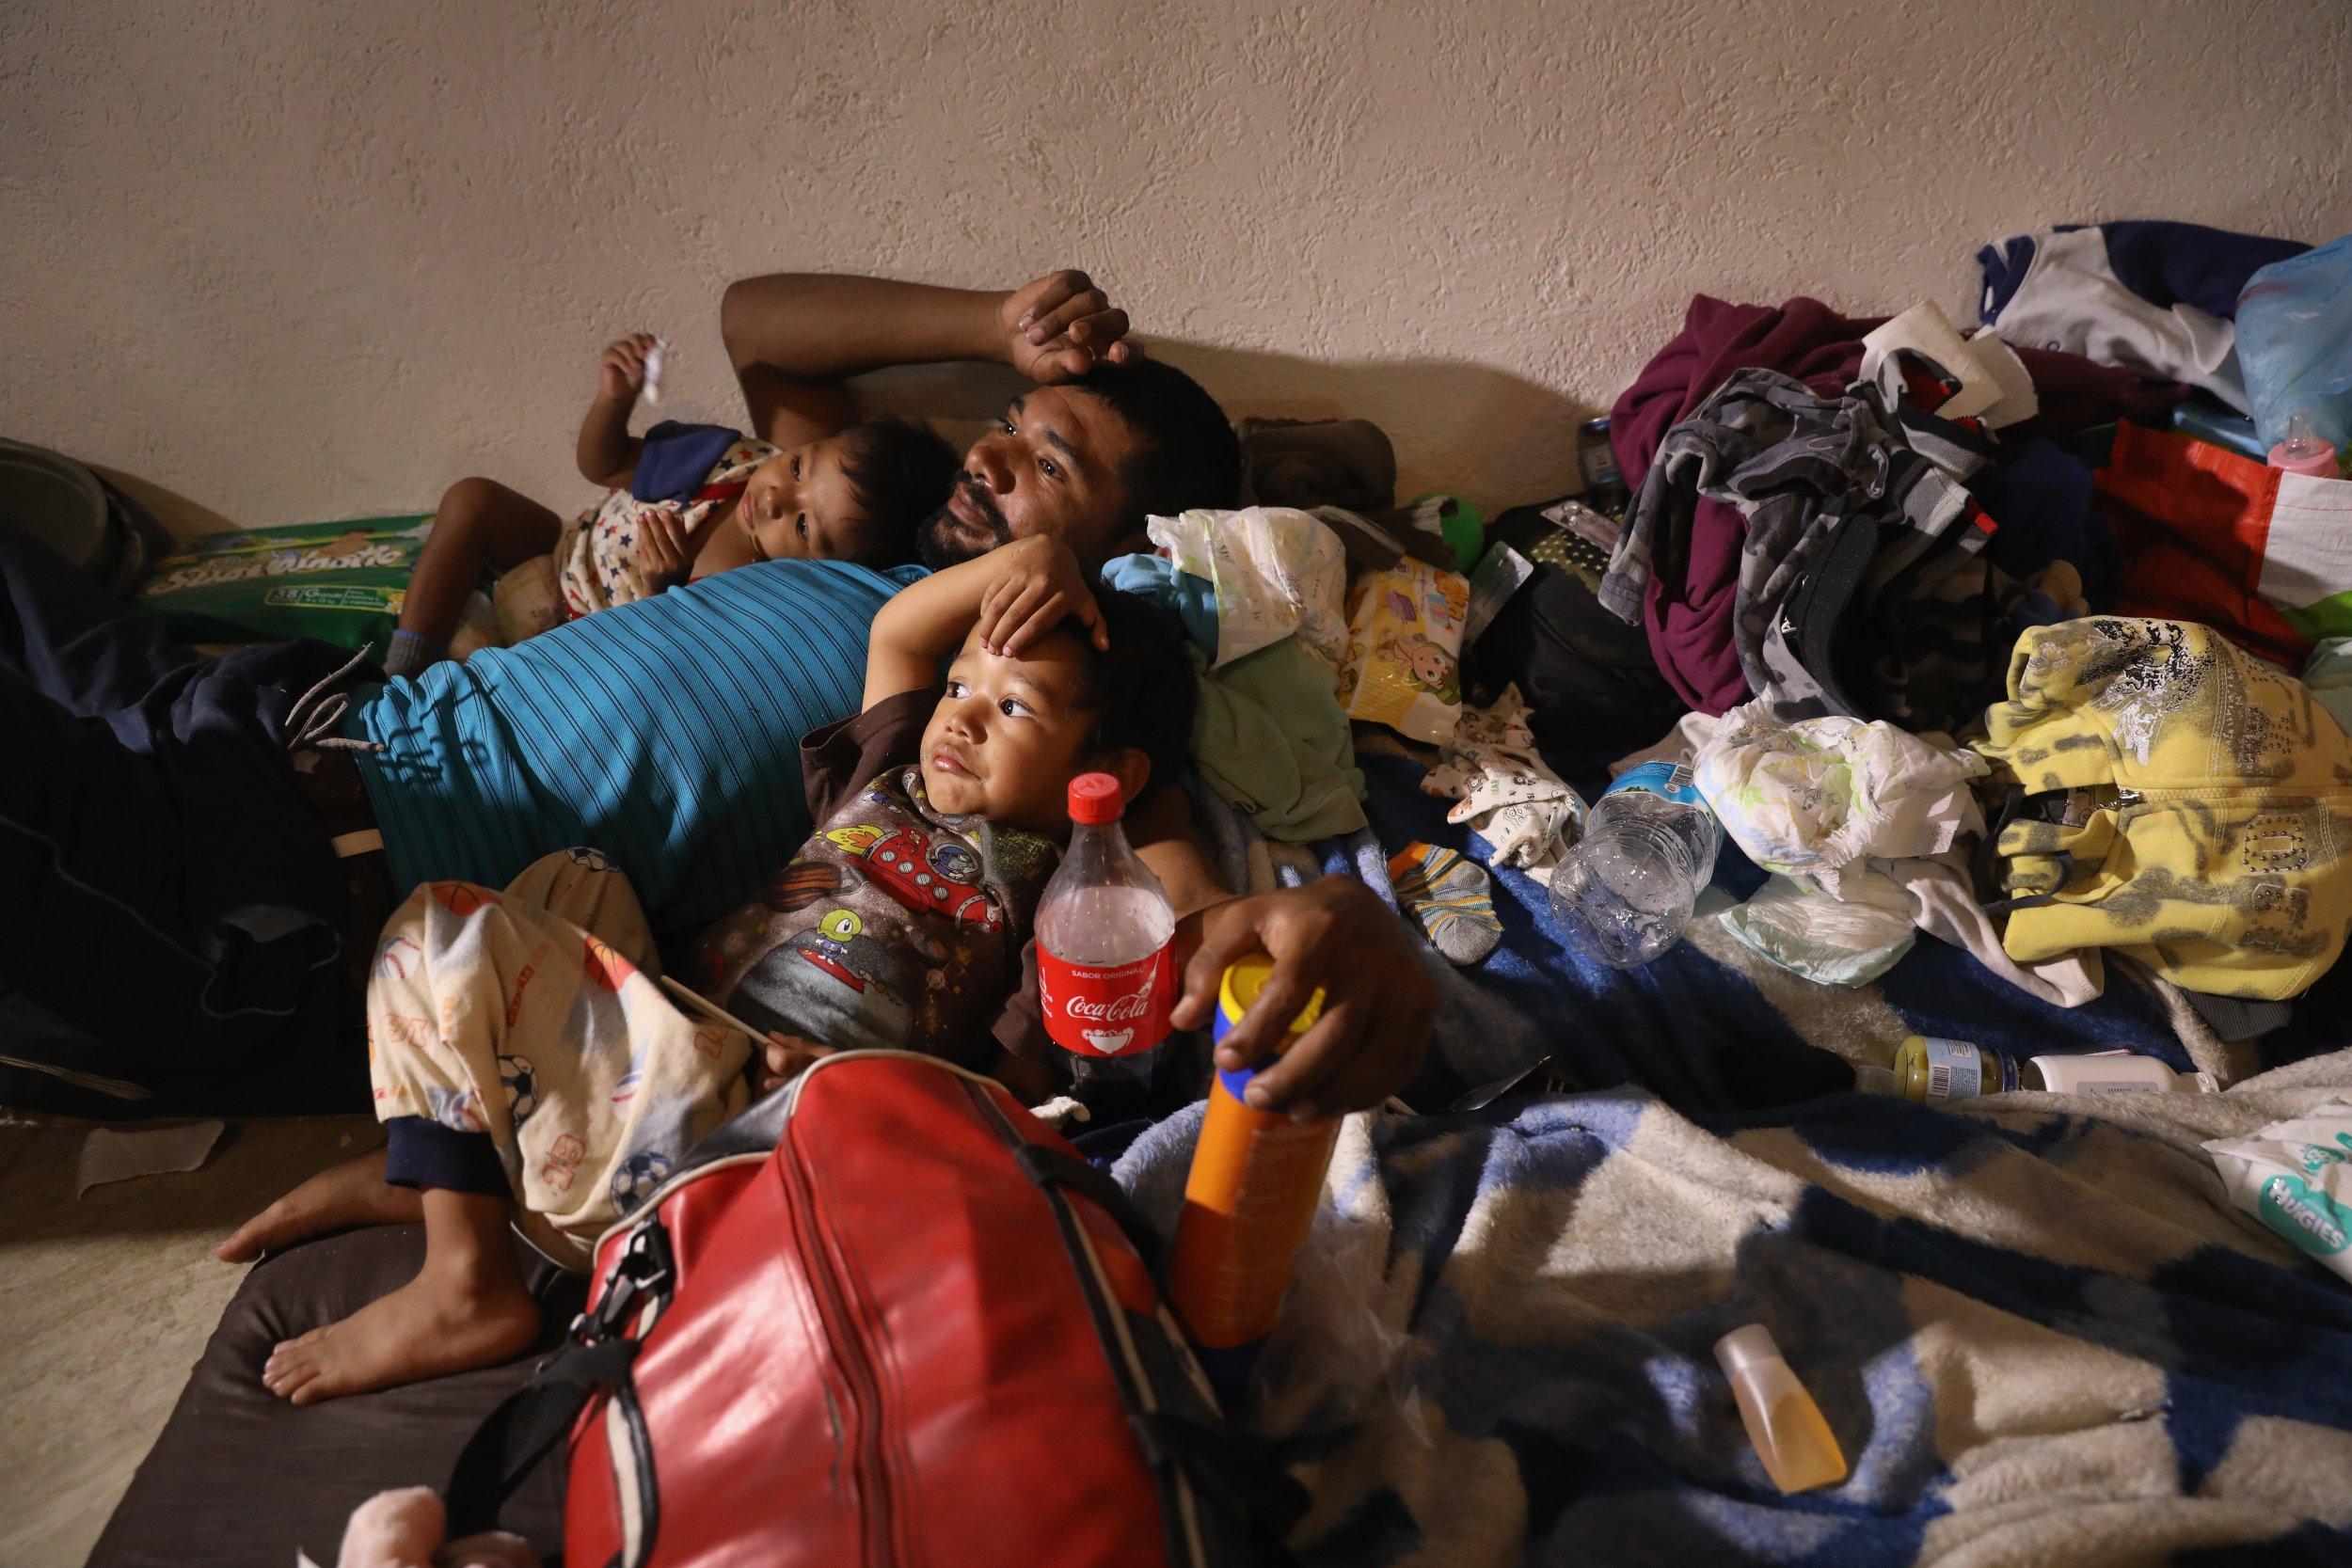 Trump brands migrant caravan a 'disgrace,' orders Homeland Security to turn away immigrants at border (newsweek.com)